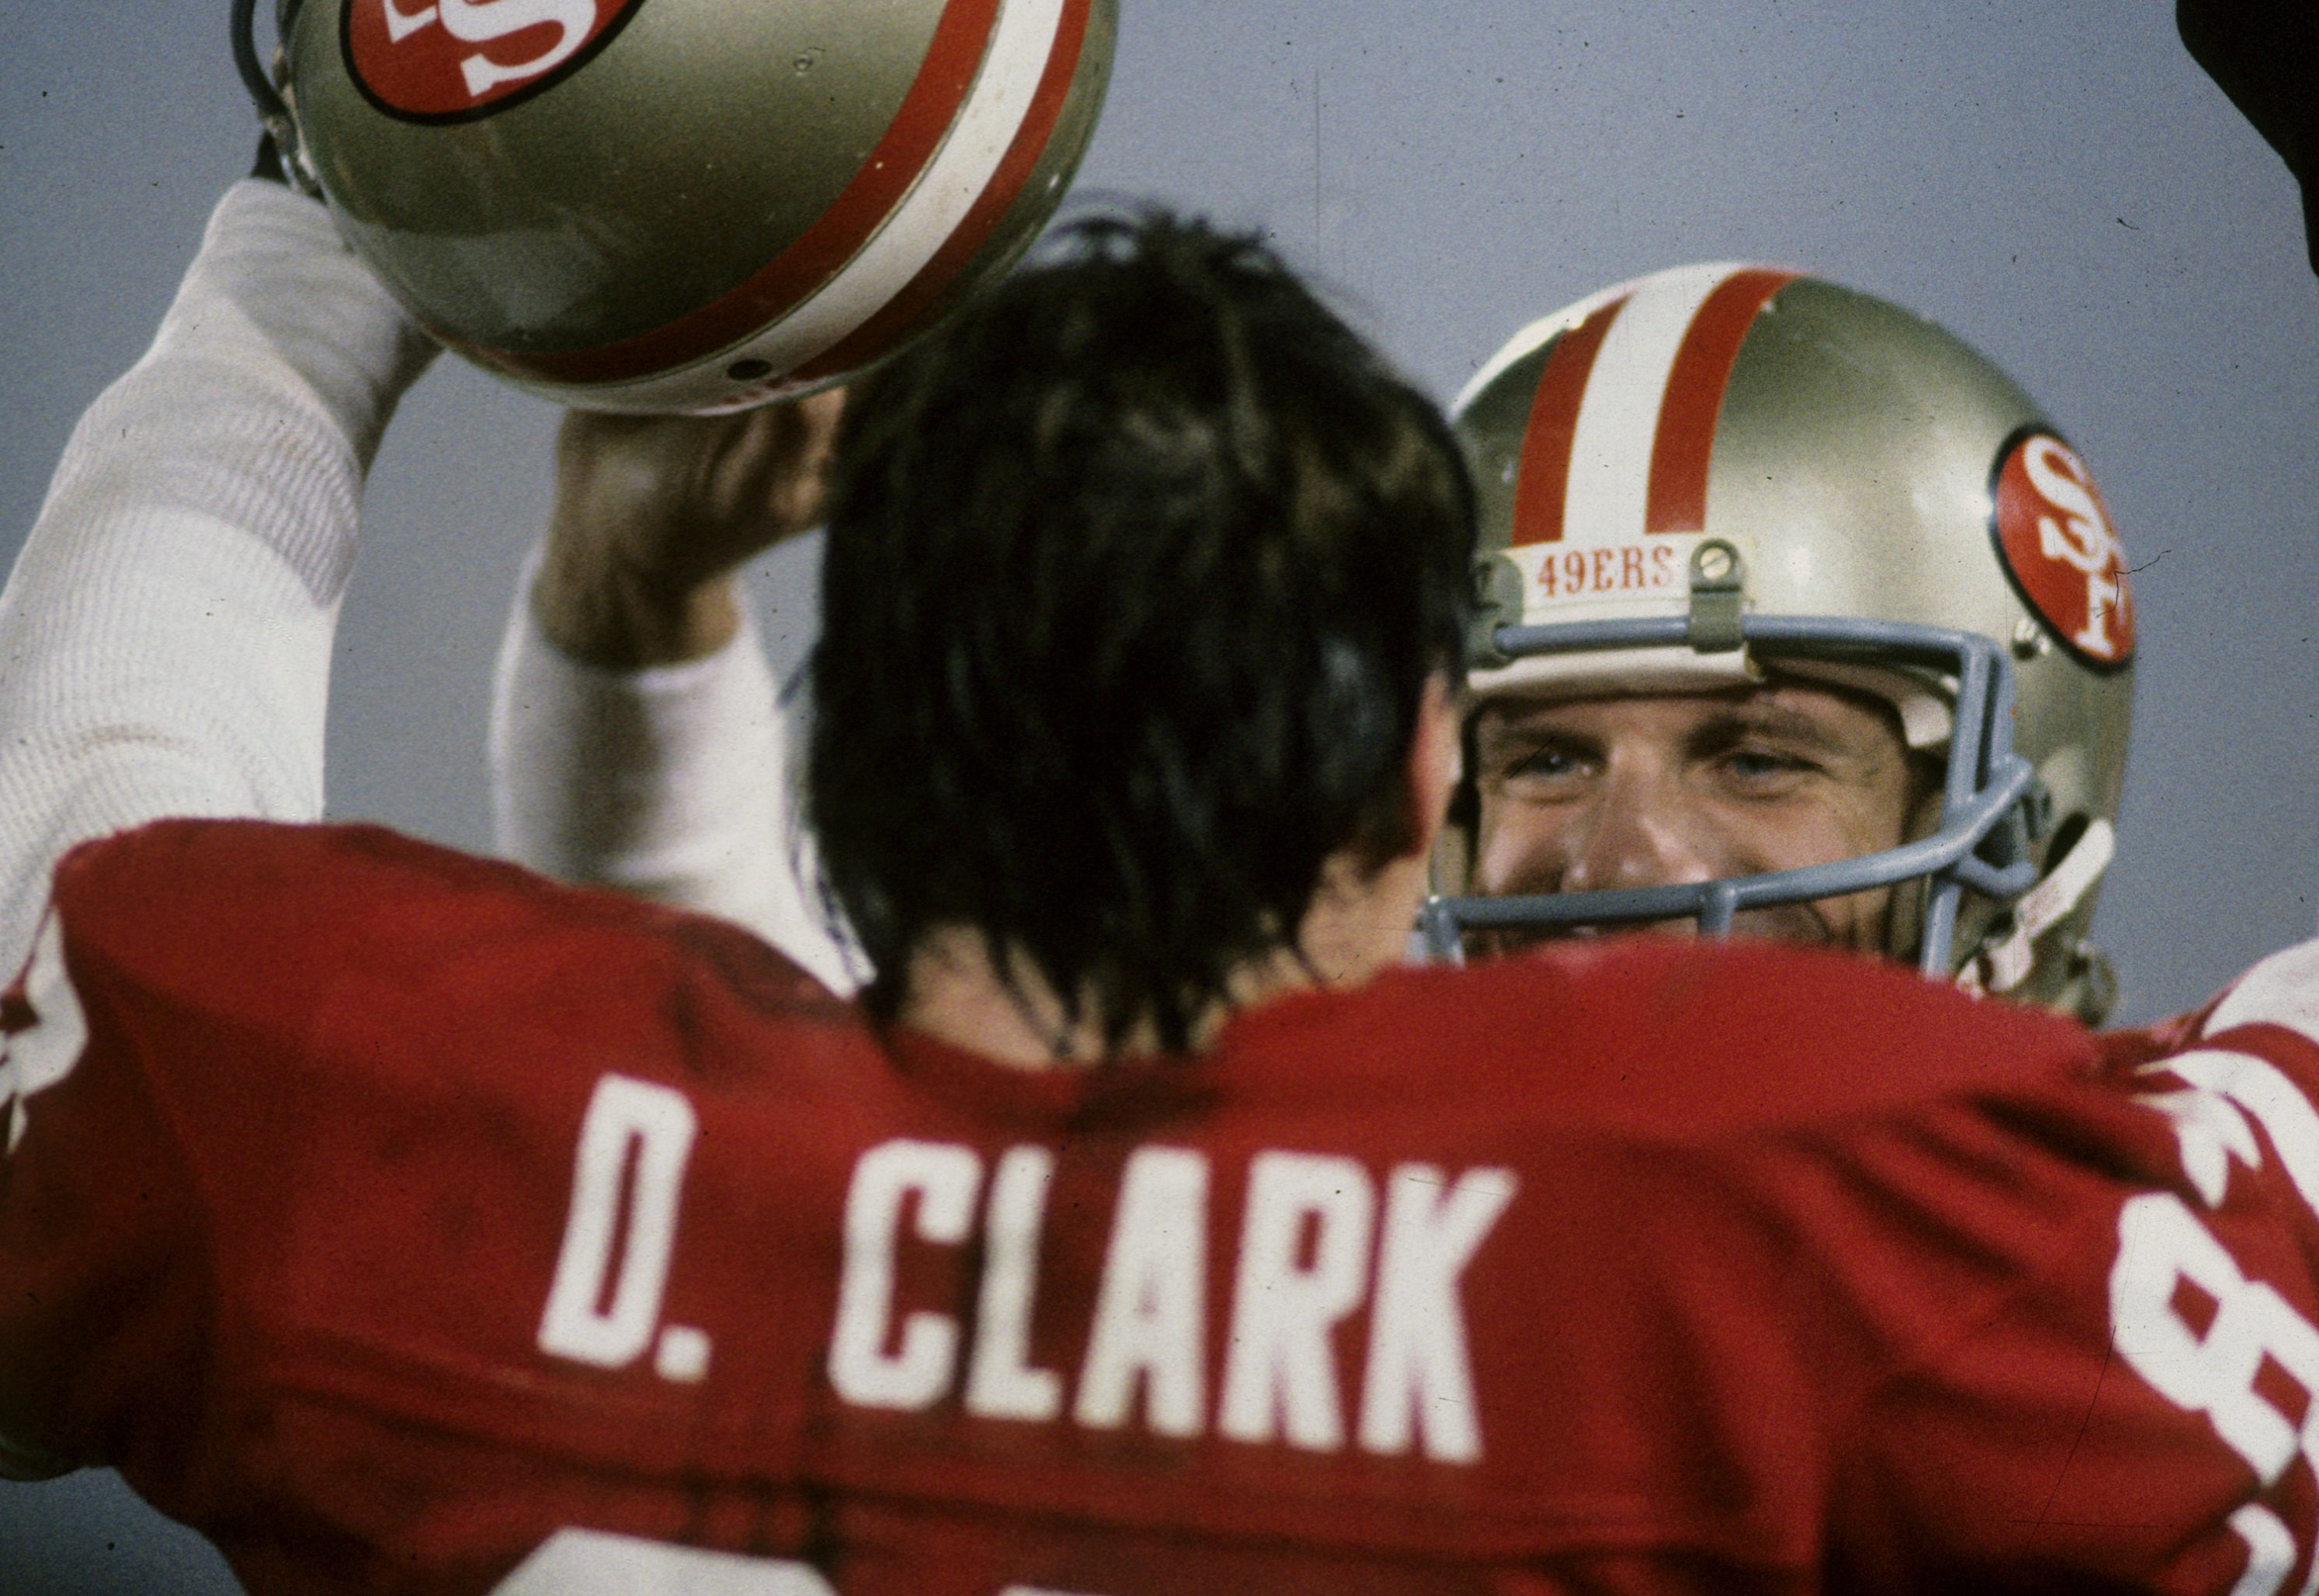 NFL Nostalgia: Ranking the Best Teams in NFL History | Bleacher